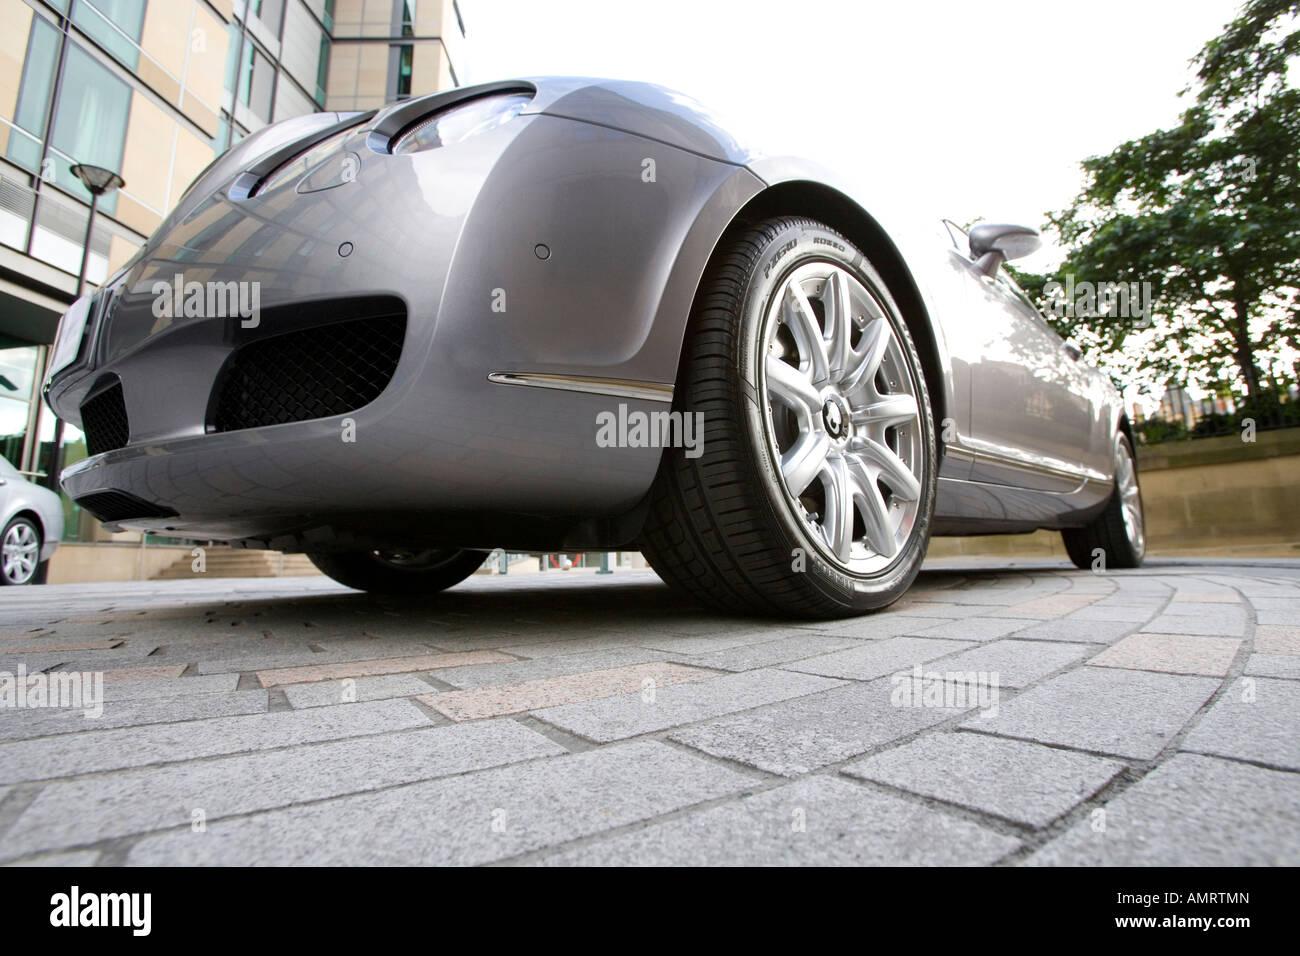 Bentley motor Car - Stock Image